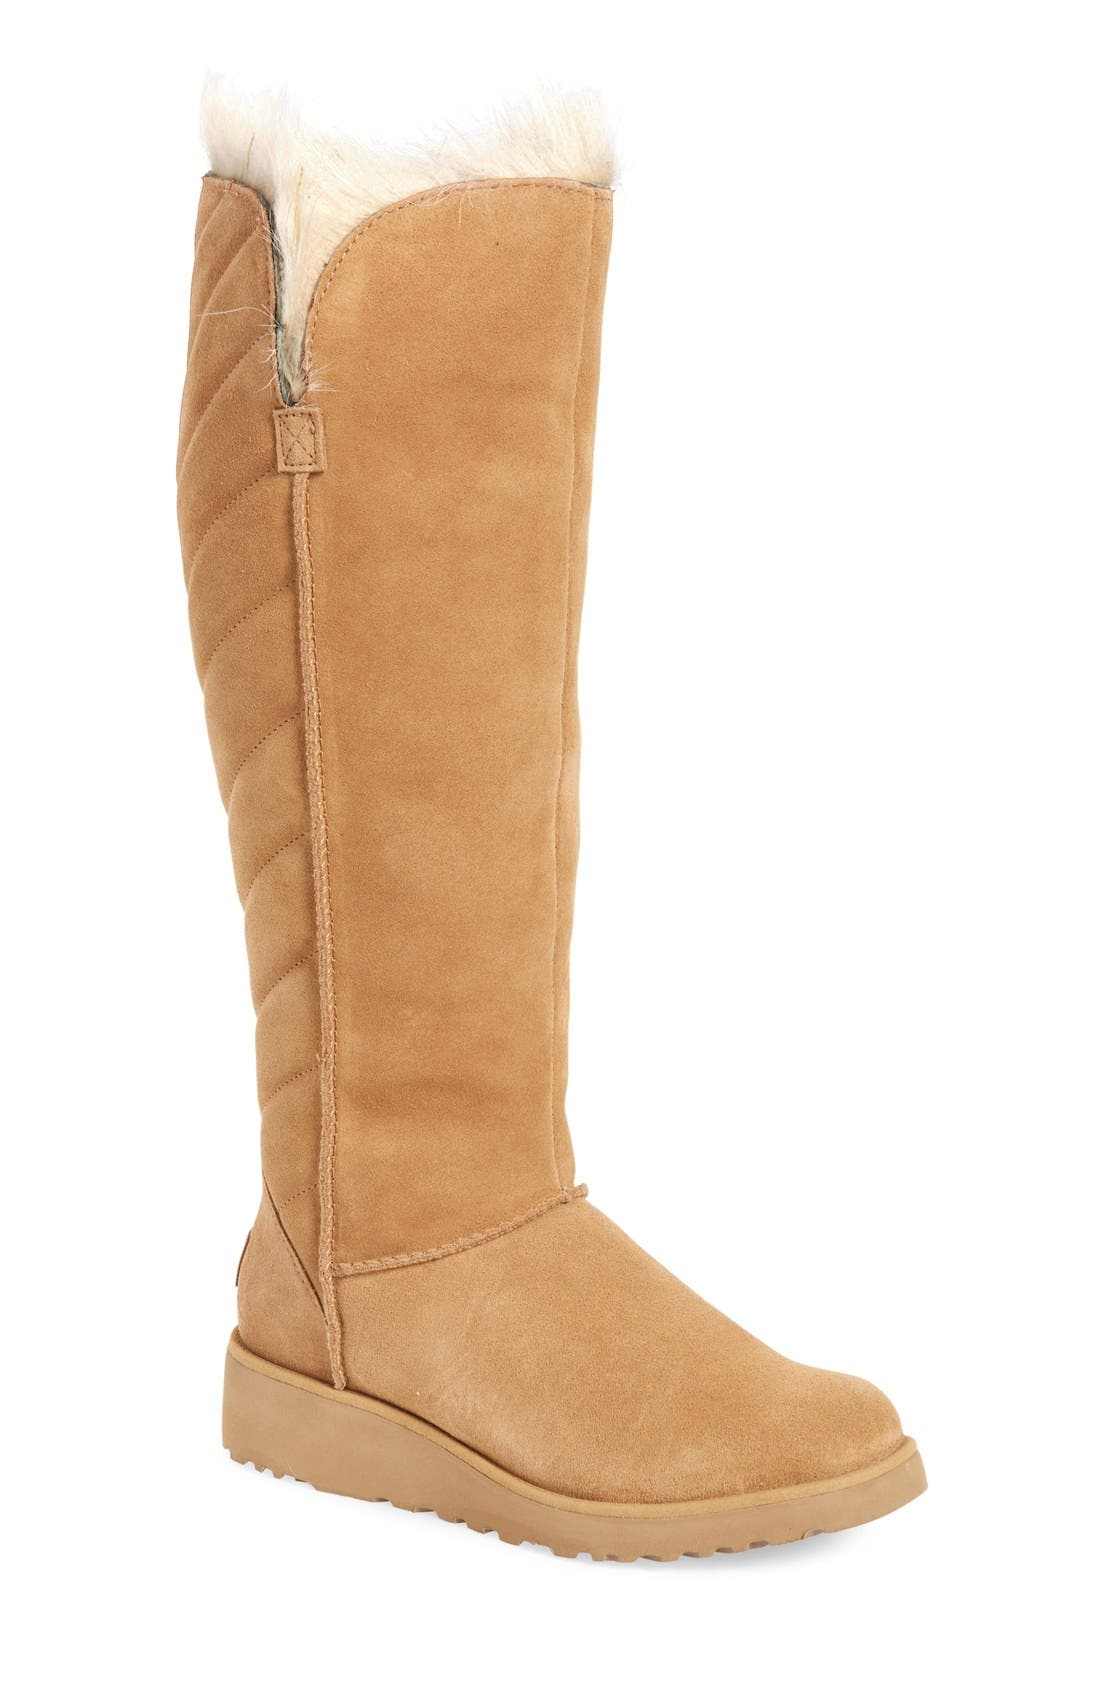 Main Image - UGG® 'Rosalind' Tall Boot (Women)